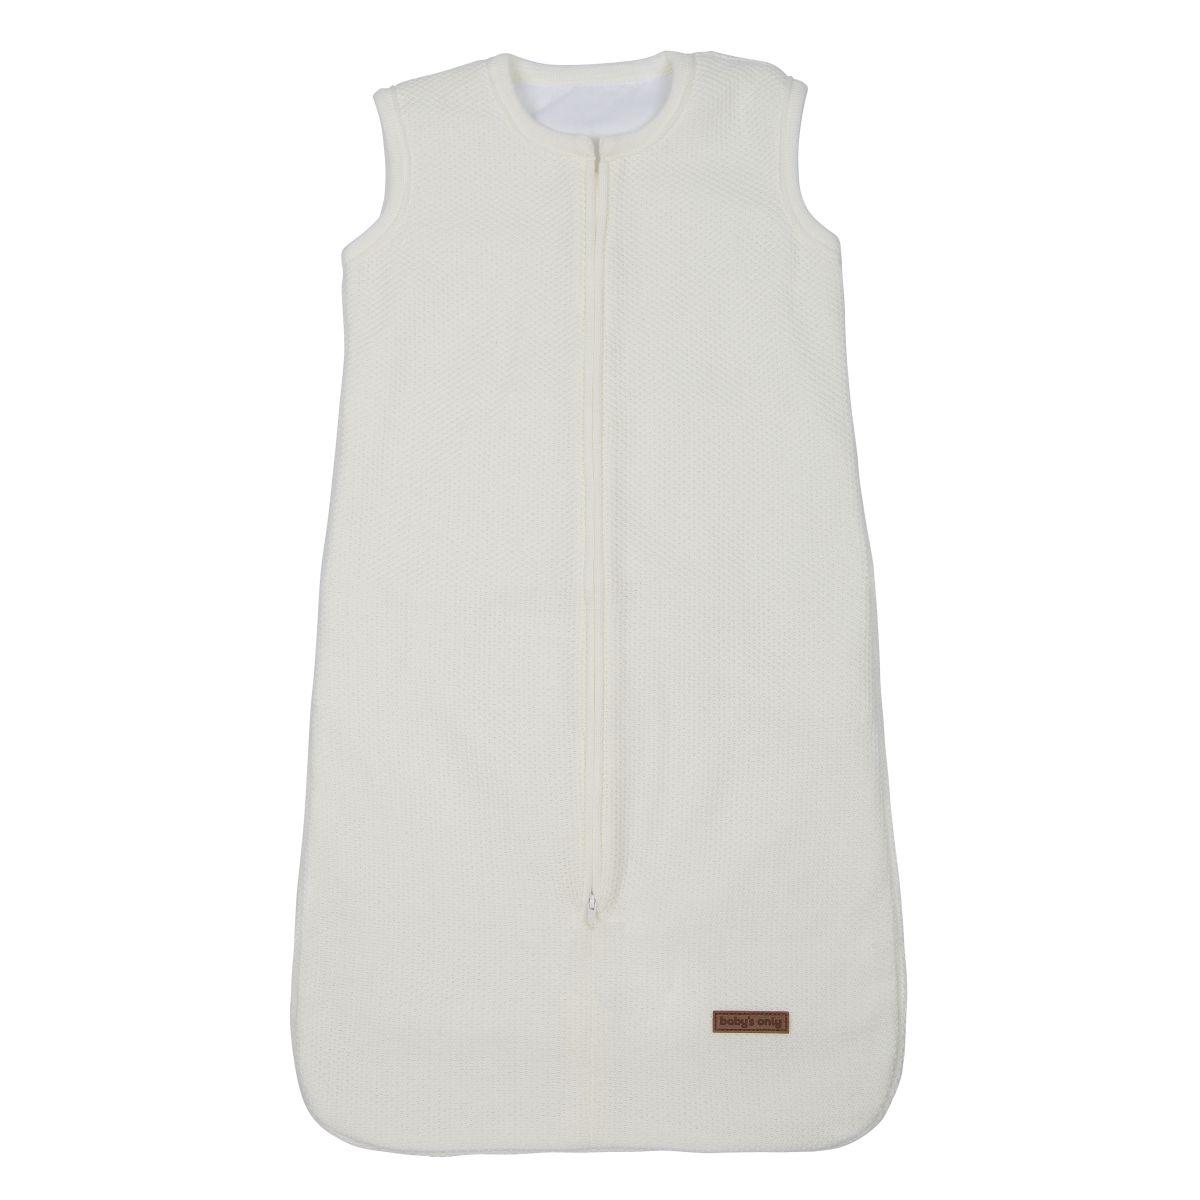 sleeping bag classic woolwhite 70 cm